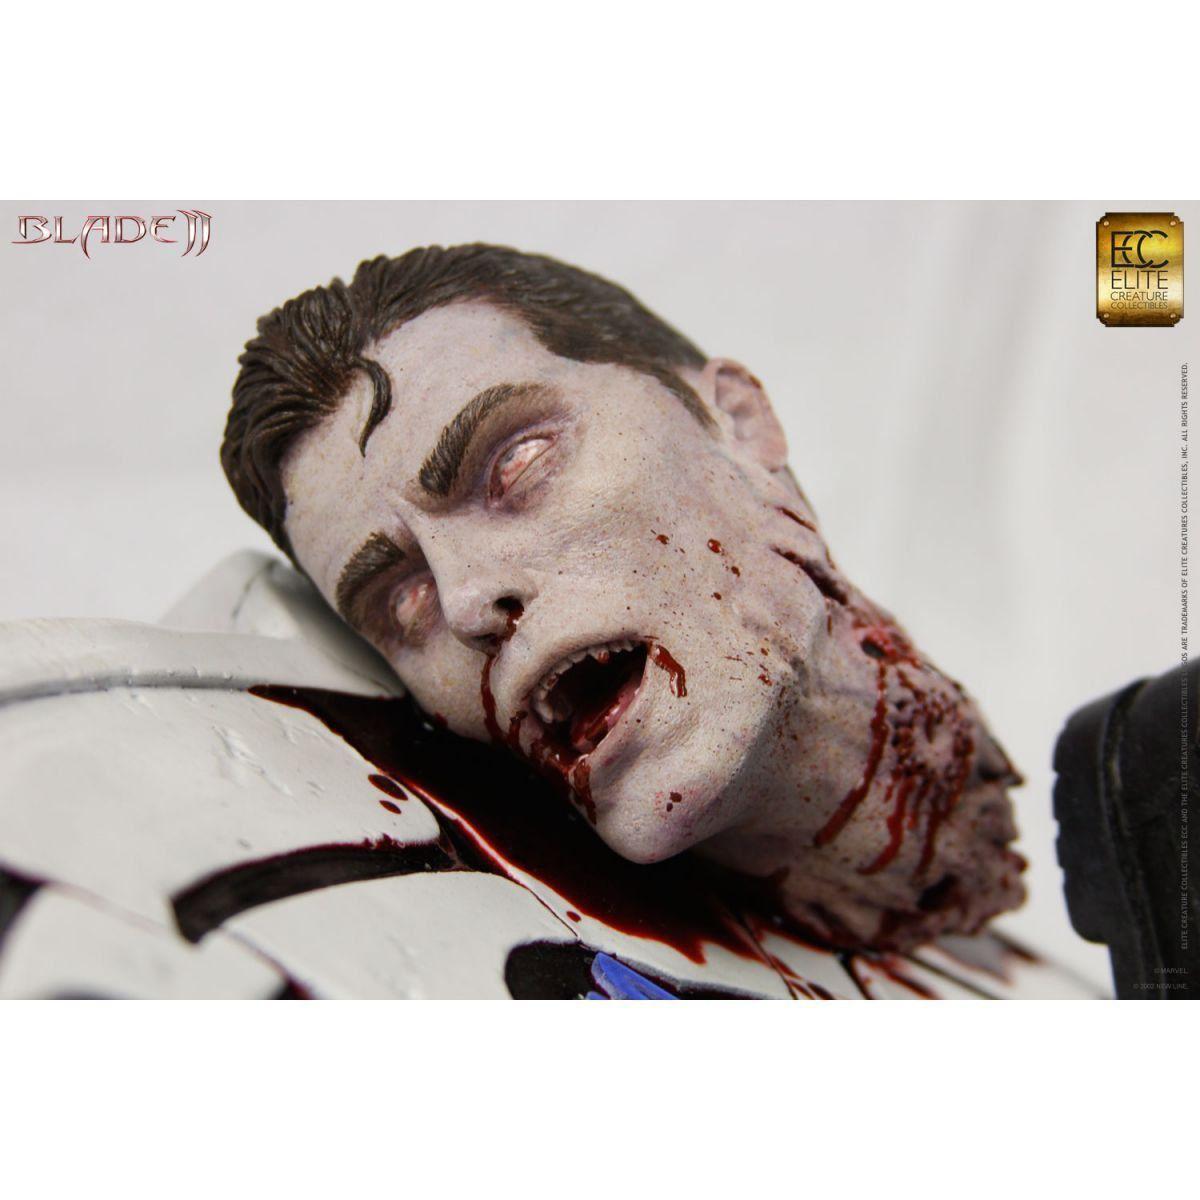 Estátua Reaper (Vampiro): Blade 2 Maquette Escala 1/3 - Cinemaquette